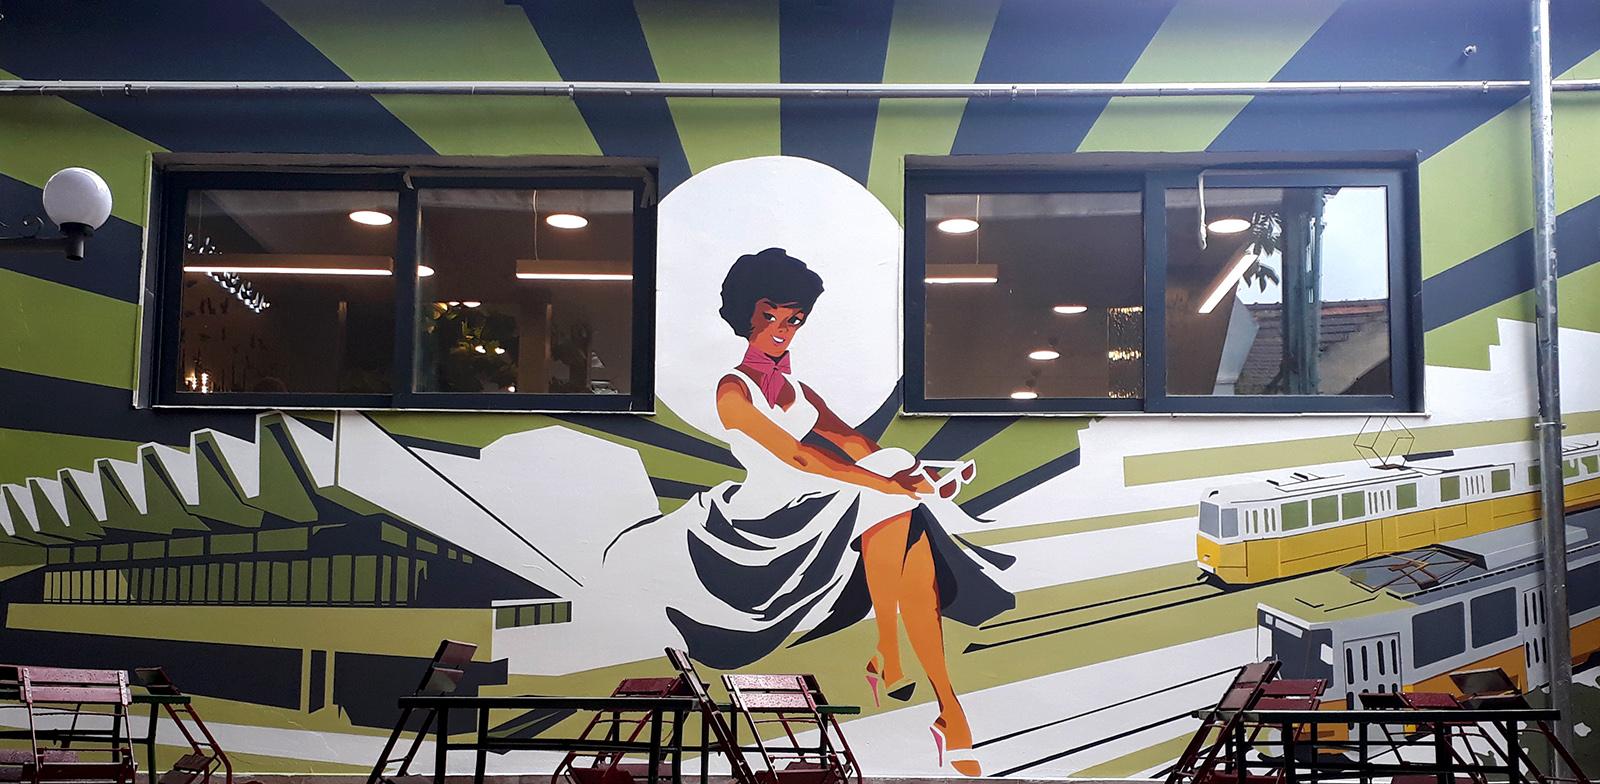 il treno dekor falfestés - neopaint works